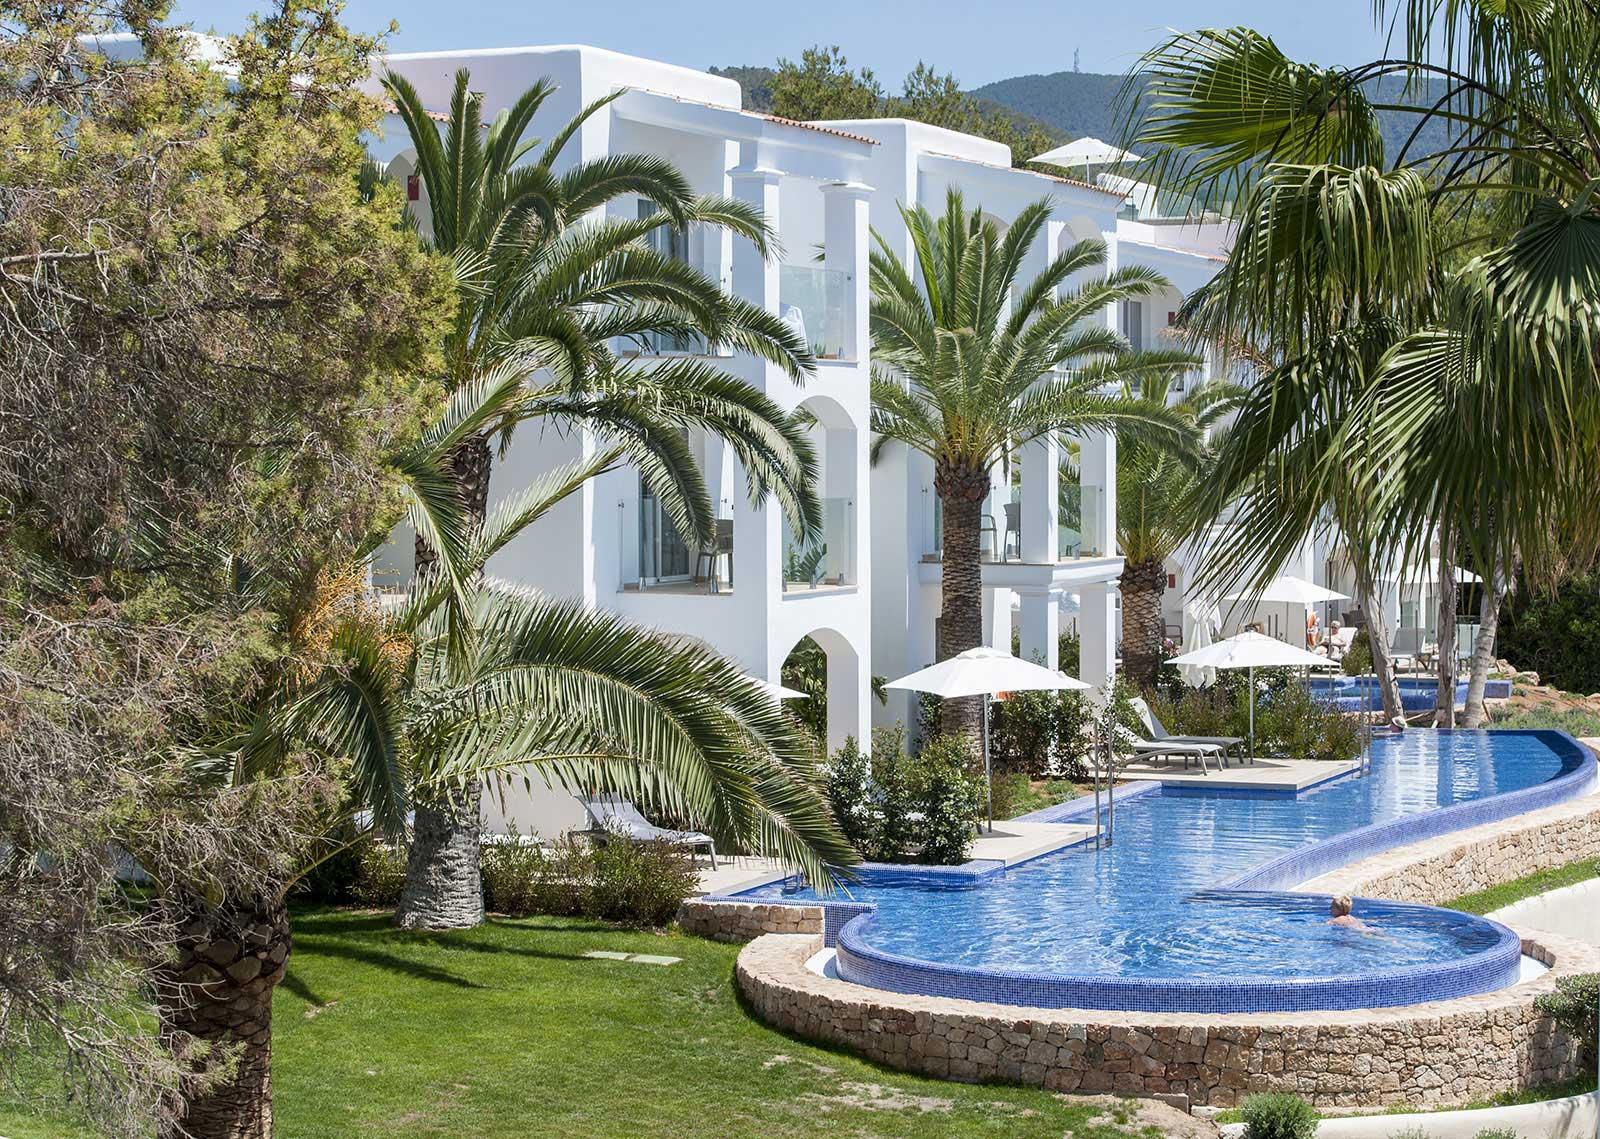 Ibiza Sensatori pool